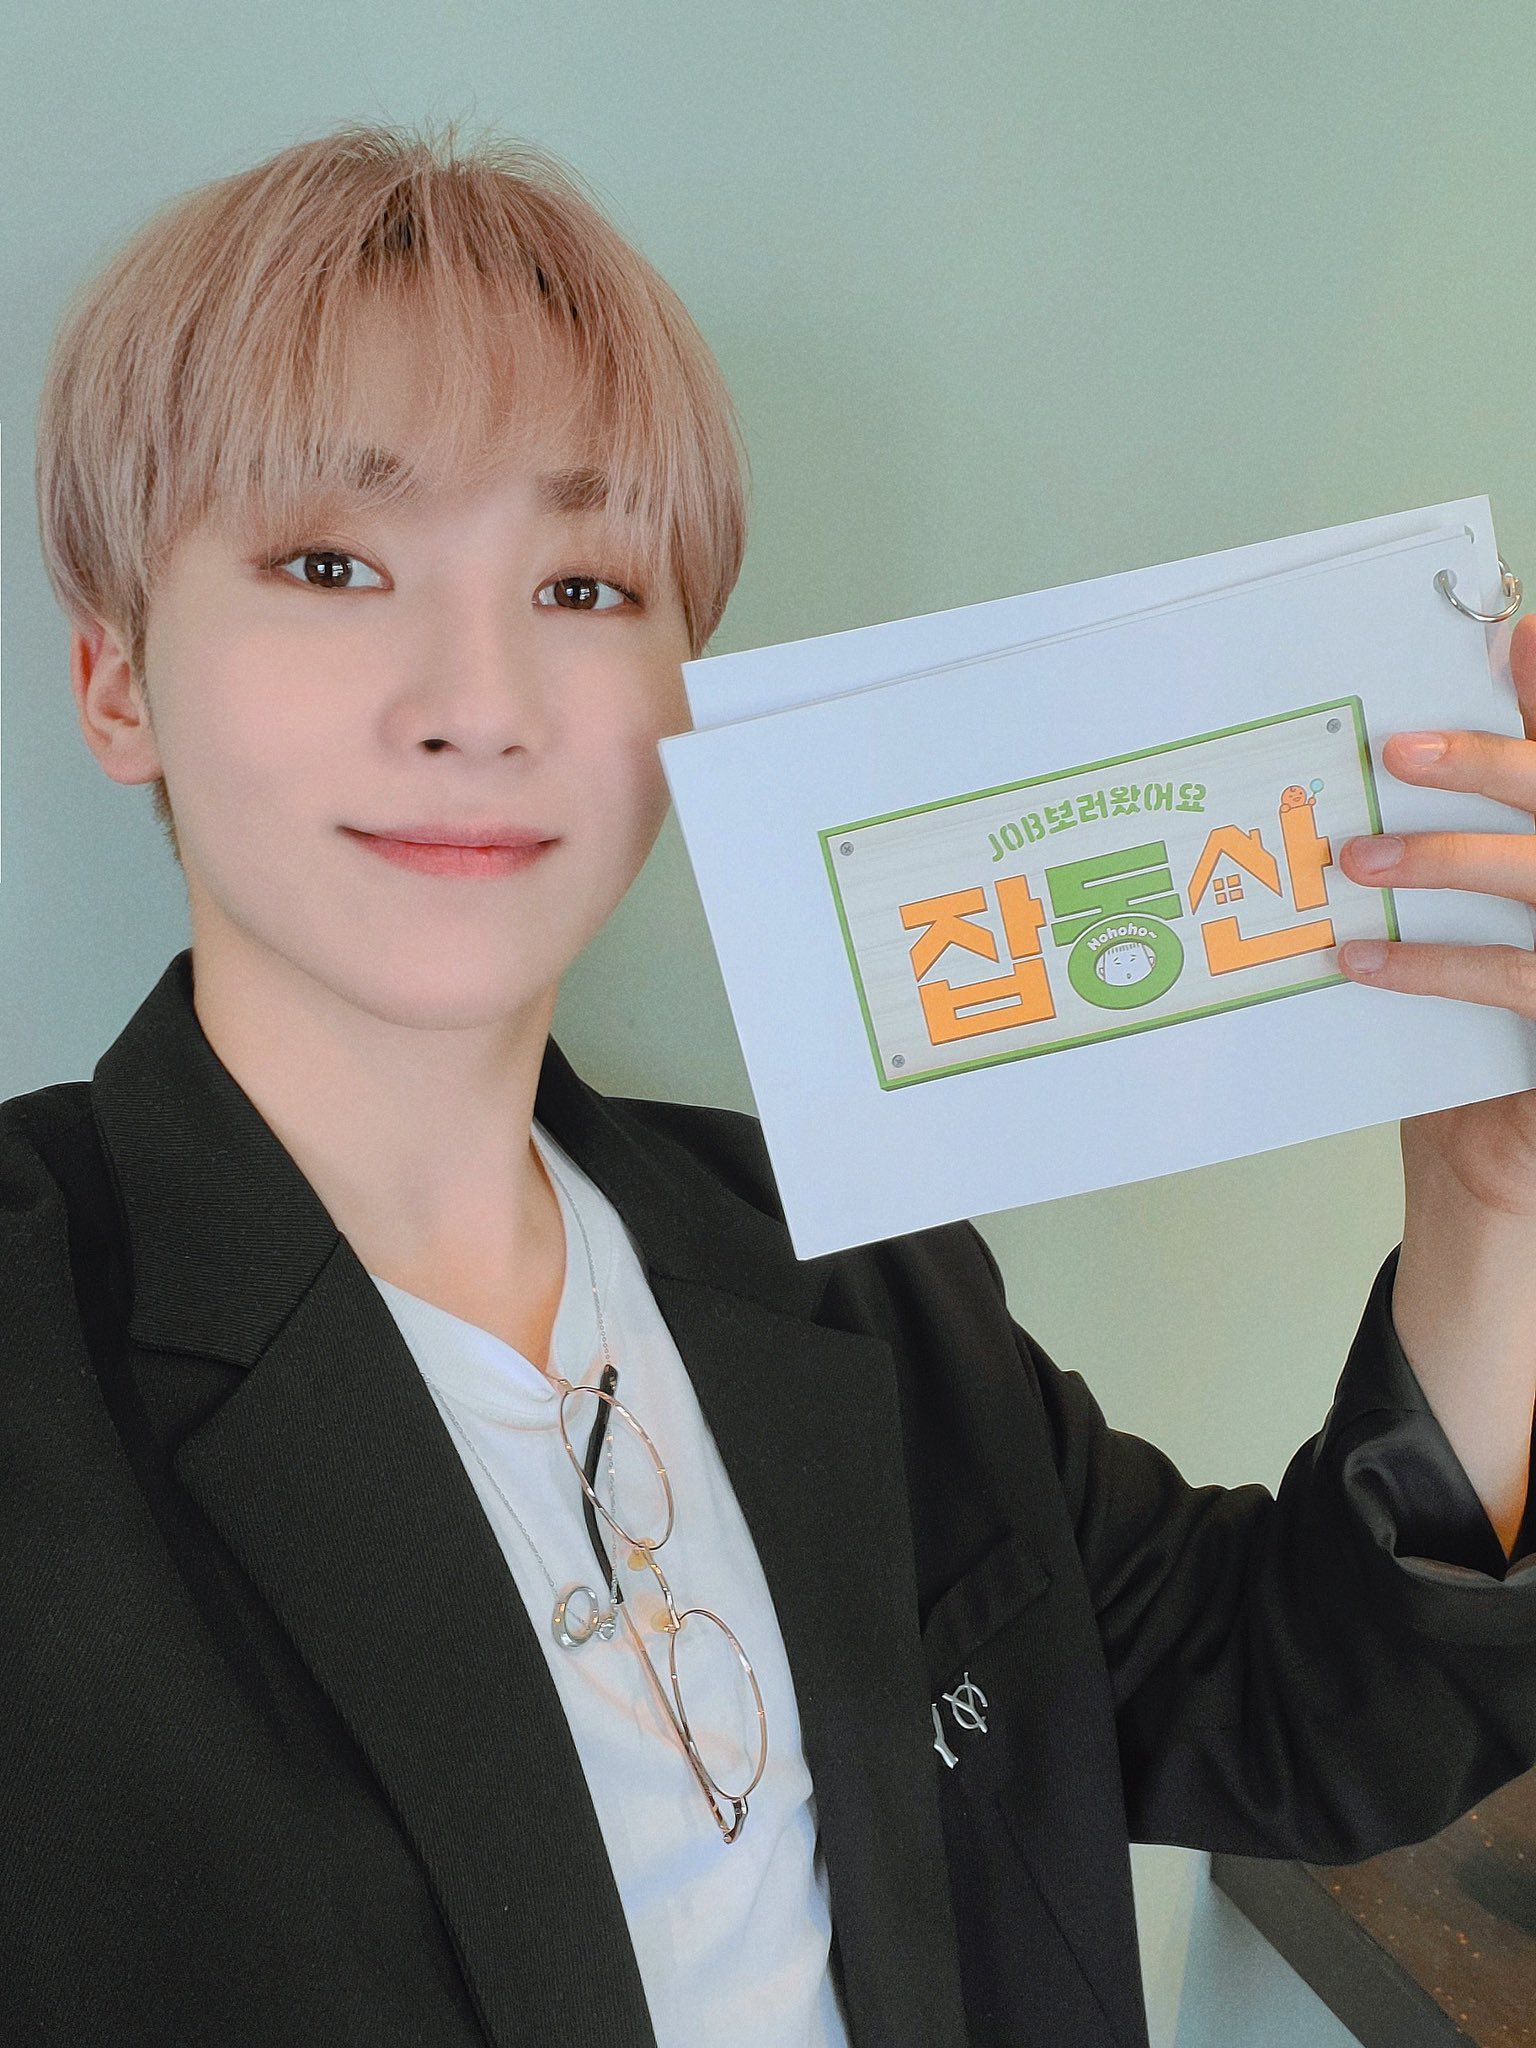 seventeen seungkwan @pledis_17